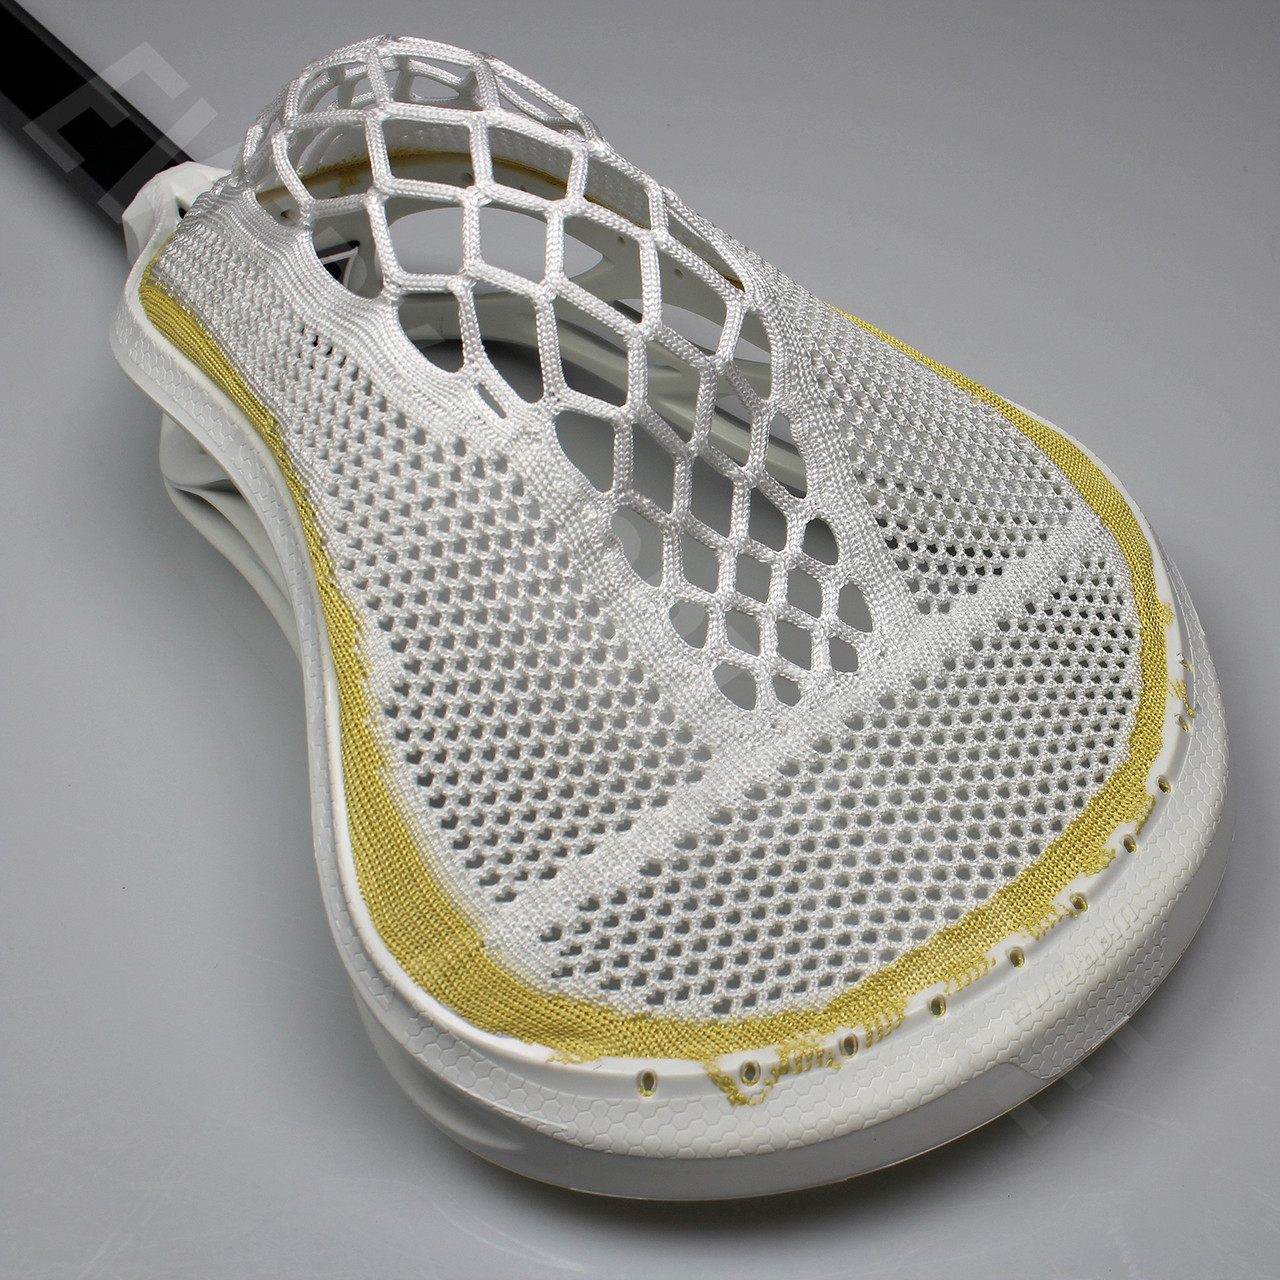 a1ea8ebb91b Warrior EVO Warp Next Complete Lacrosse Stick